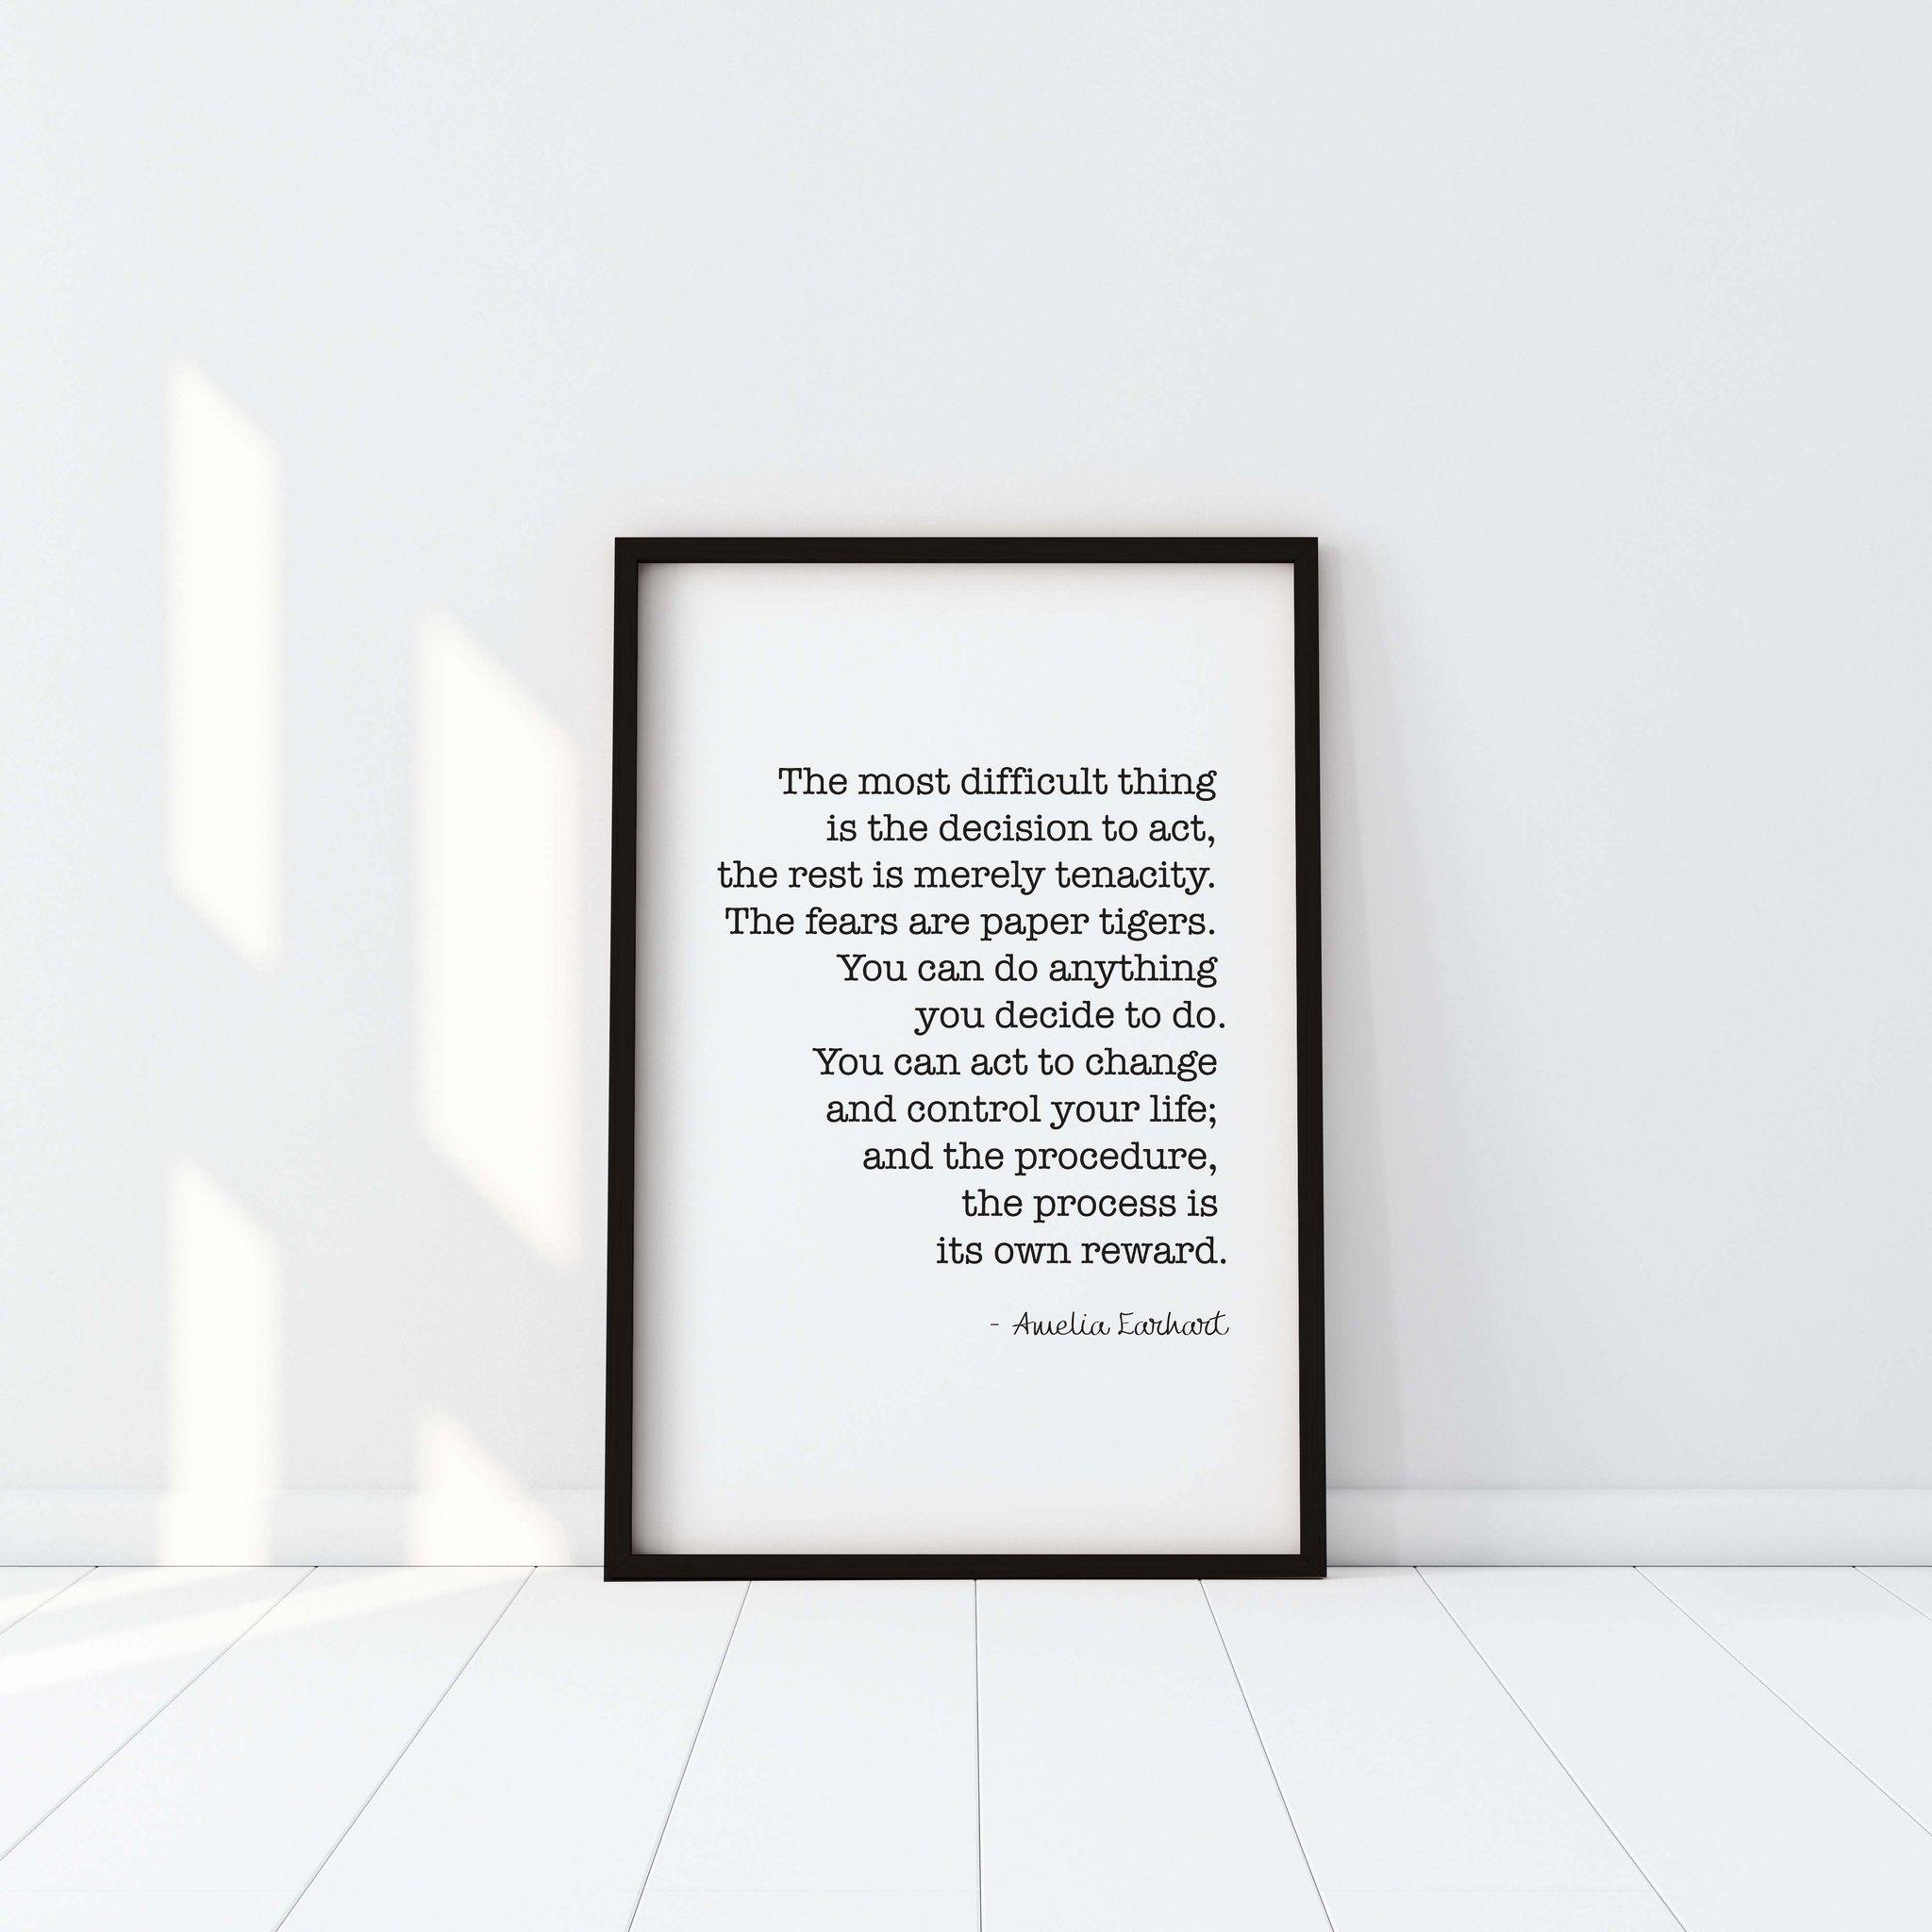 Amelia Earhart Inspirational Female Digital Wall Quote Art